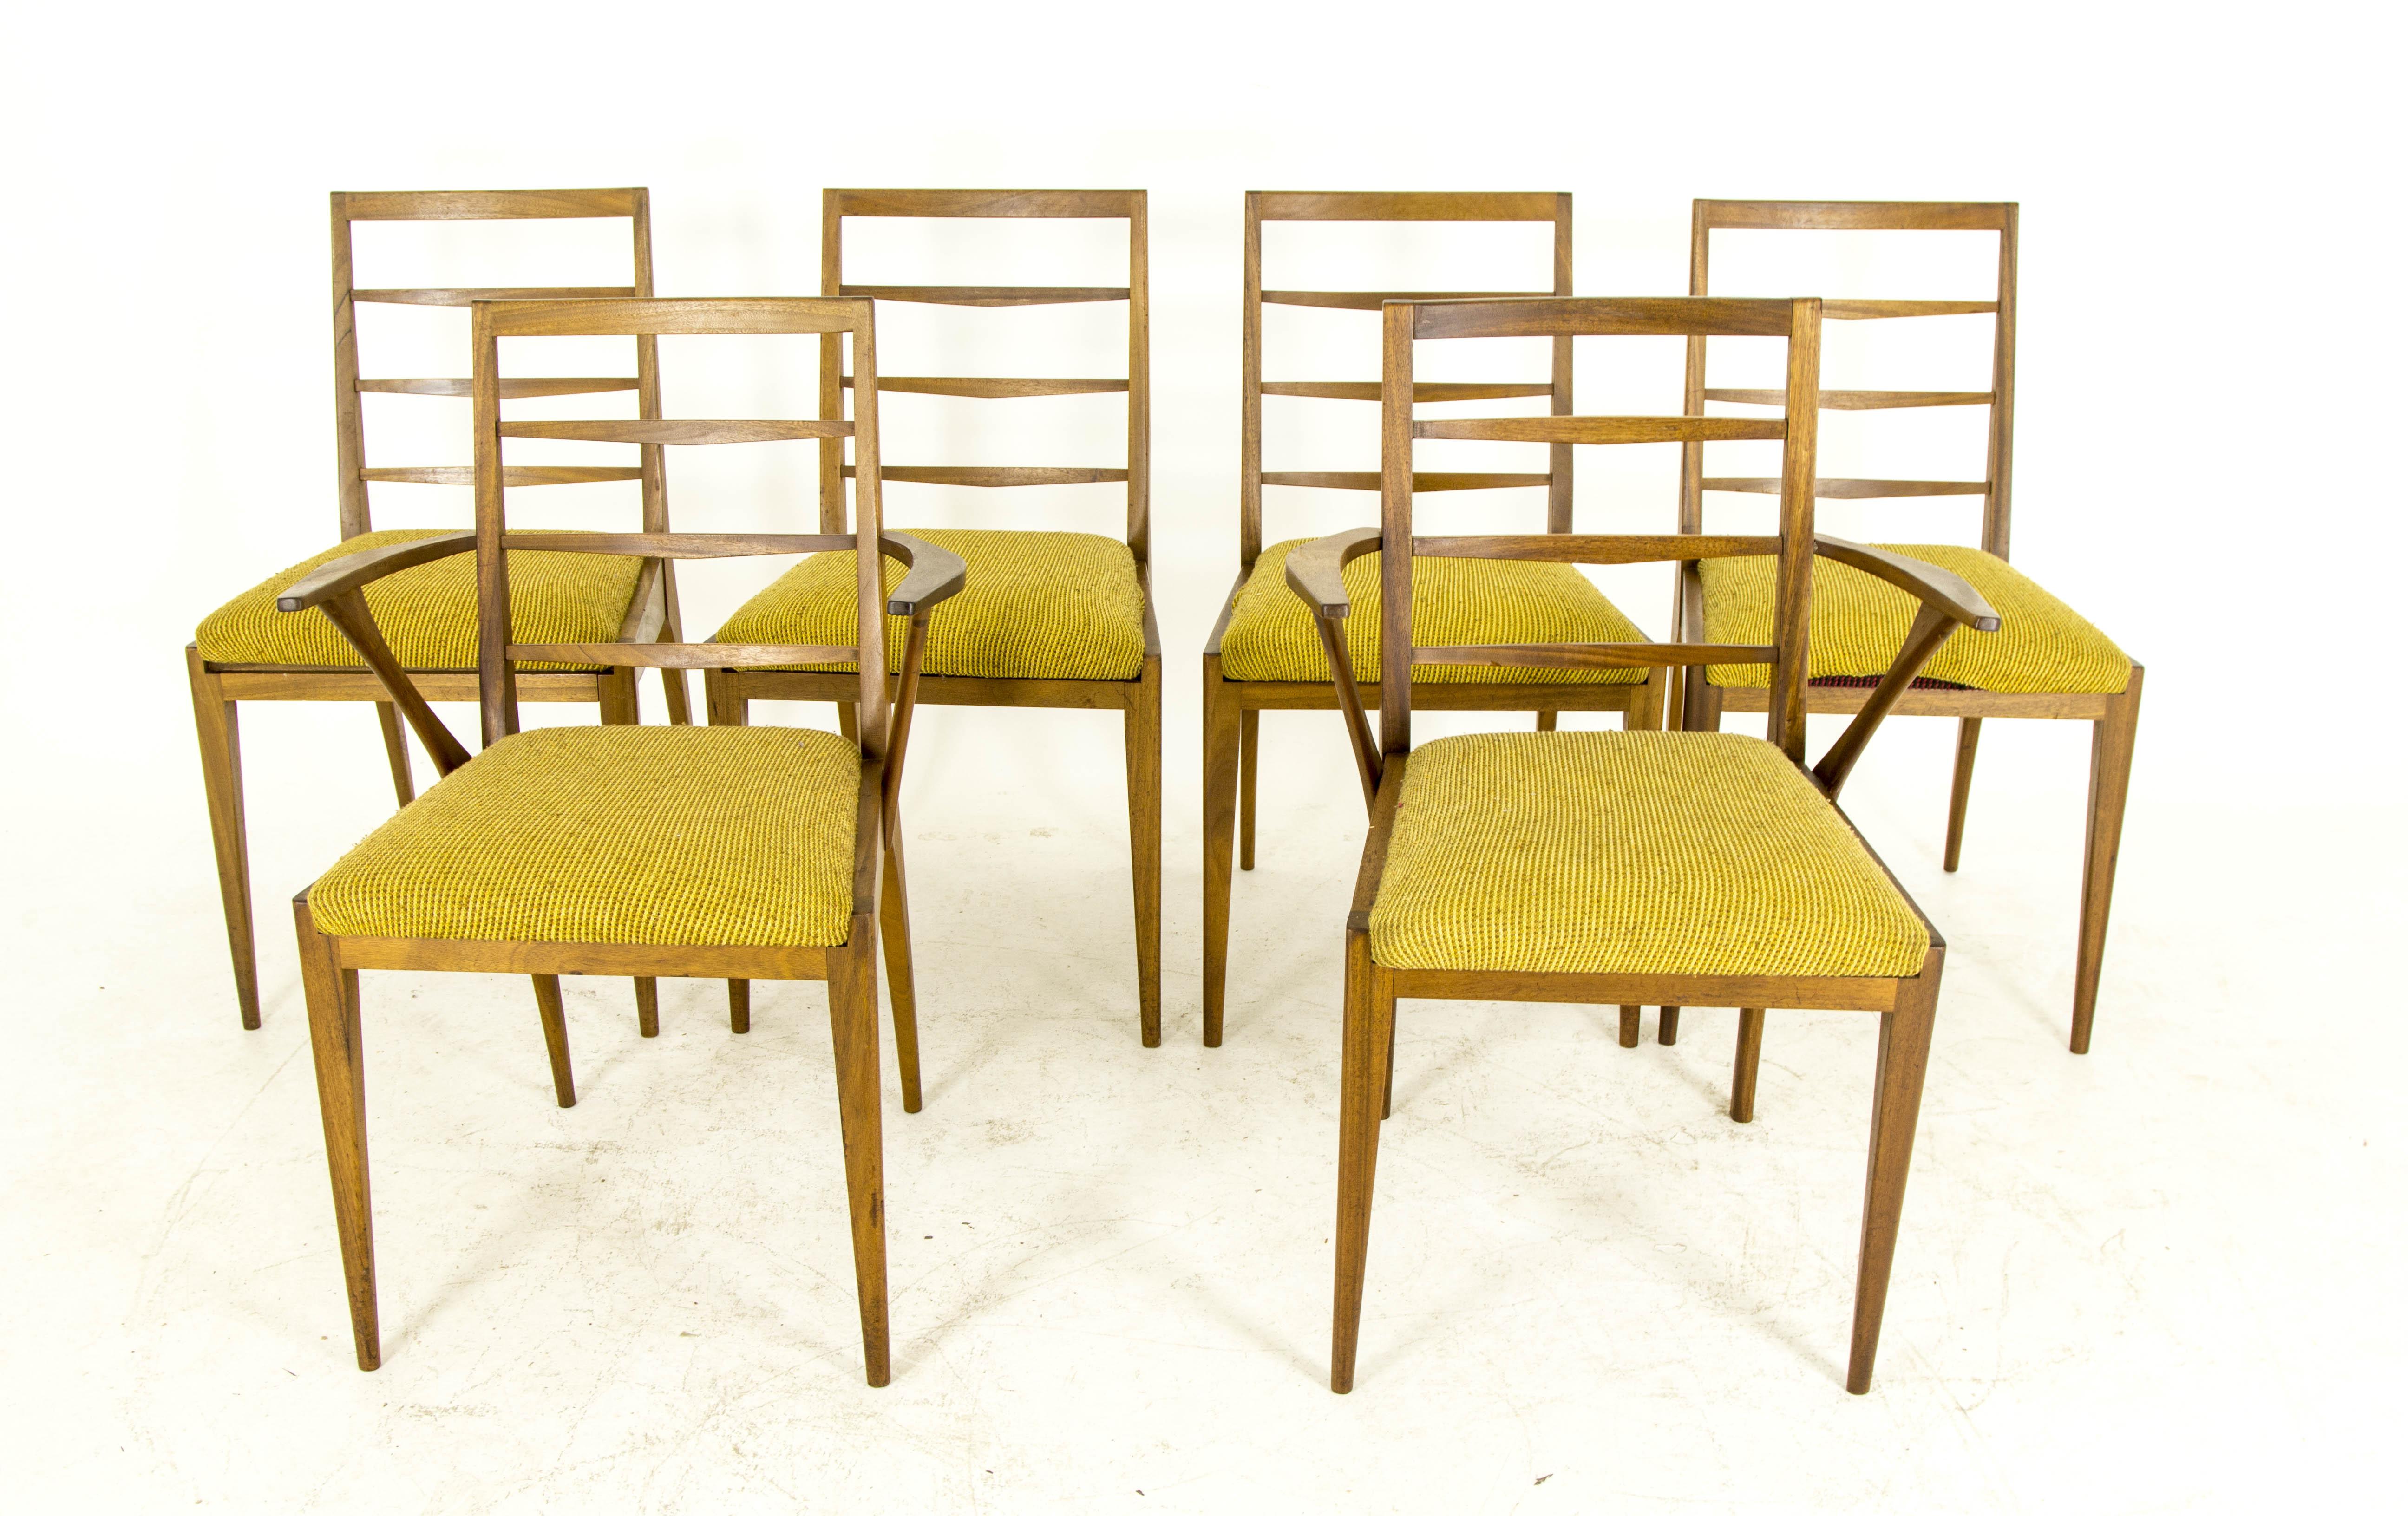 Six teak dining chairs mid century modern by g